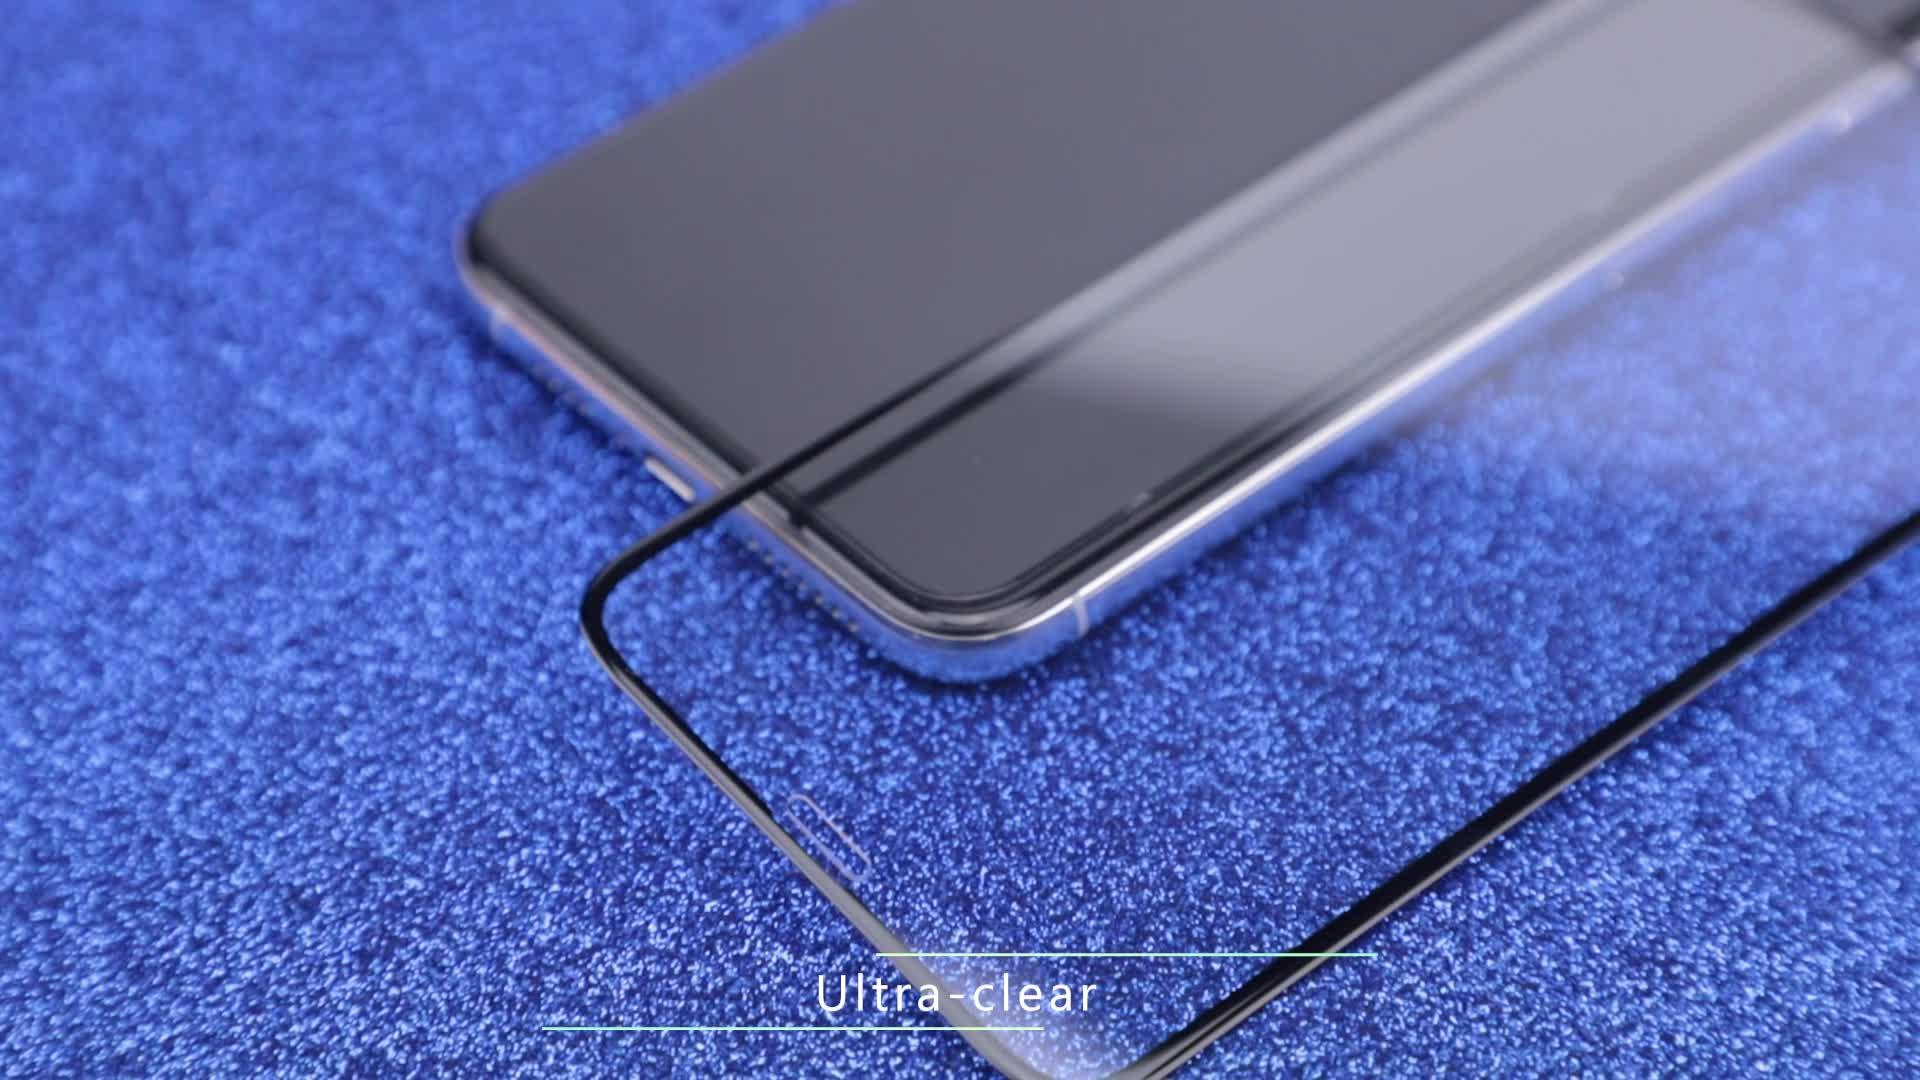 Fabriek Leverancier Groothandel Beste Mobiele Telefoon 0.33mm 9h Gehard Glas Screen Protector Voor iPhone X XR XS max